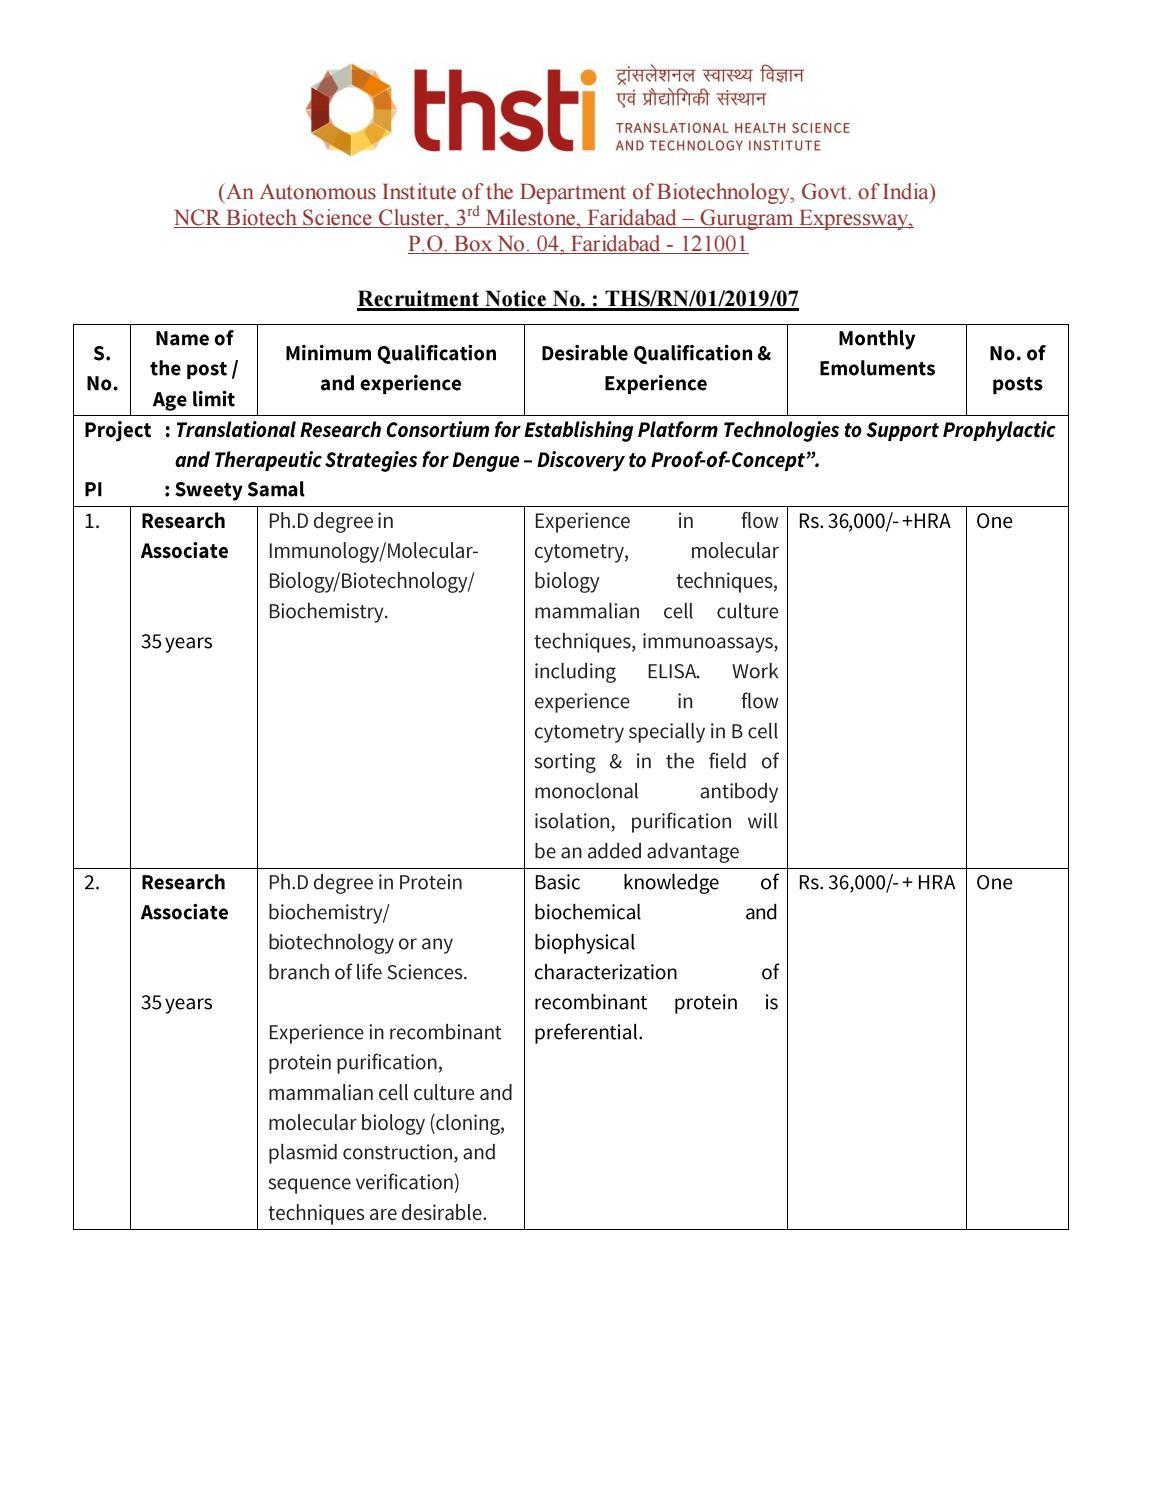 Govt THSTI PhD Research Associate Jobs - Life Sciences Apply